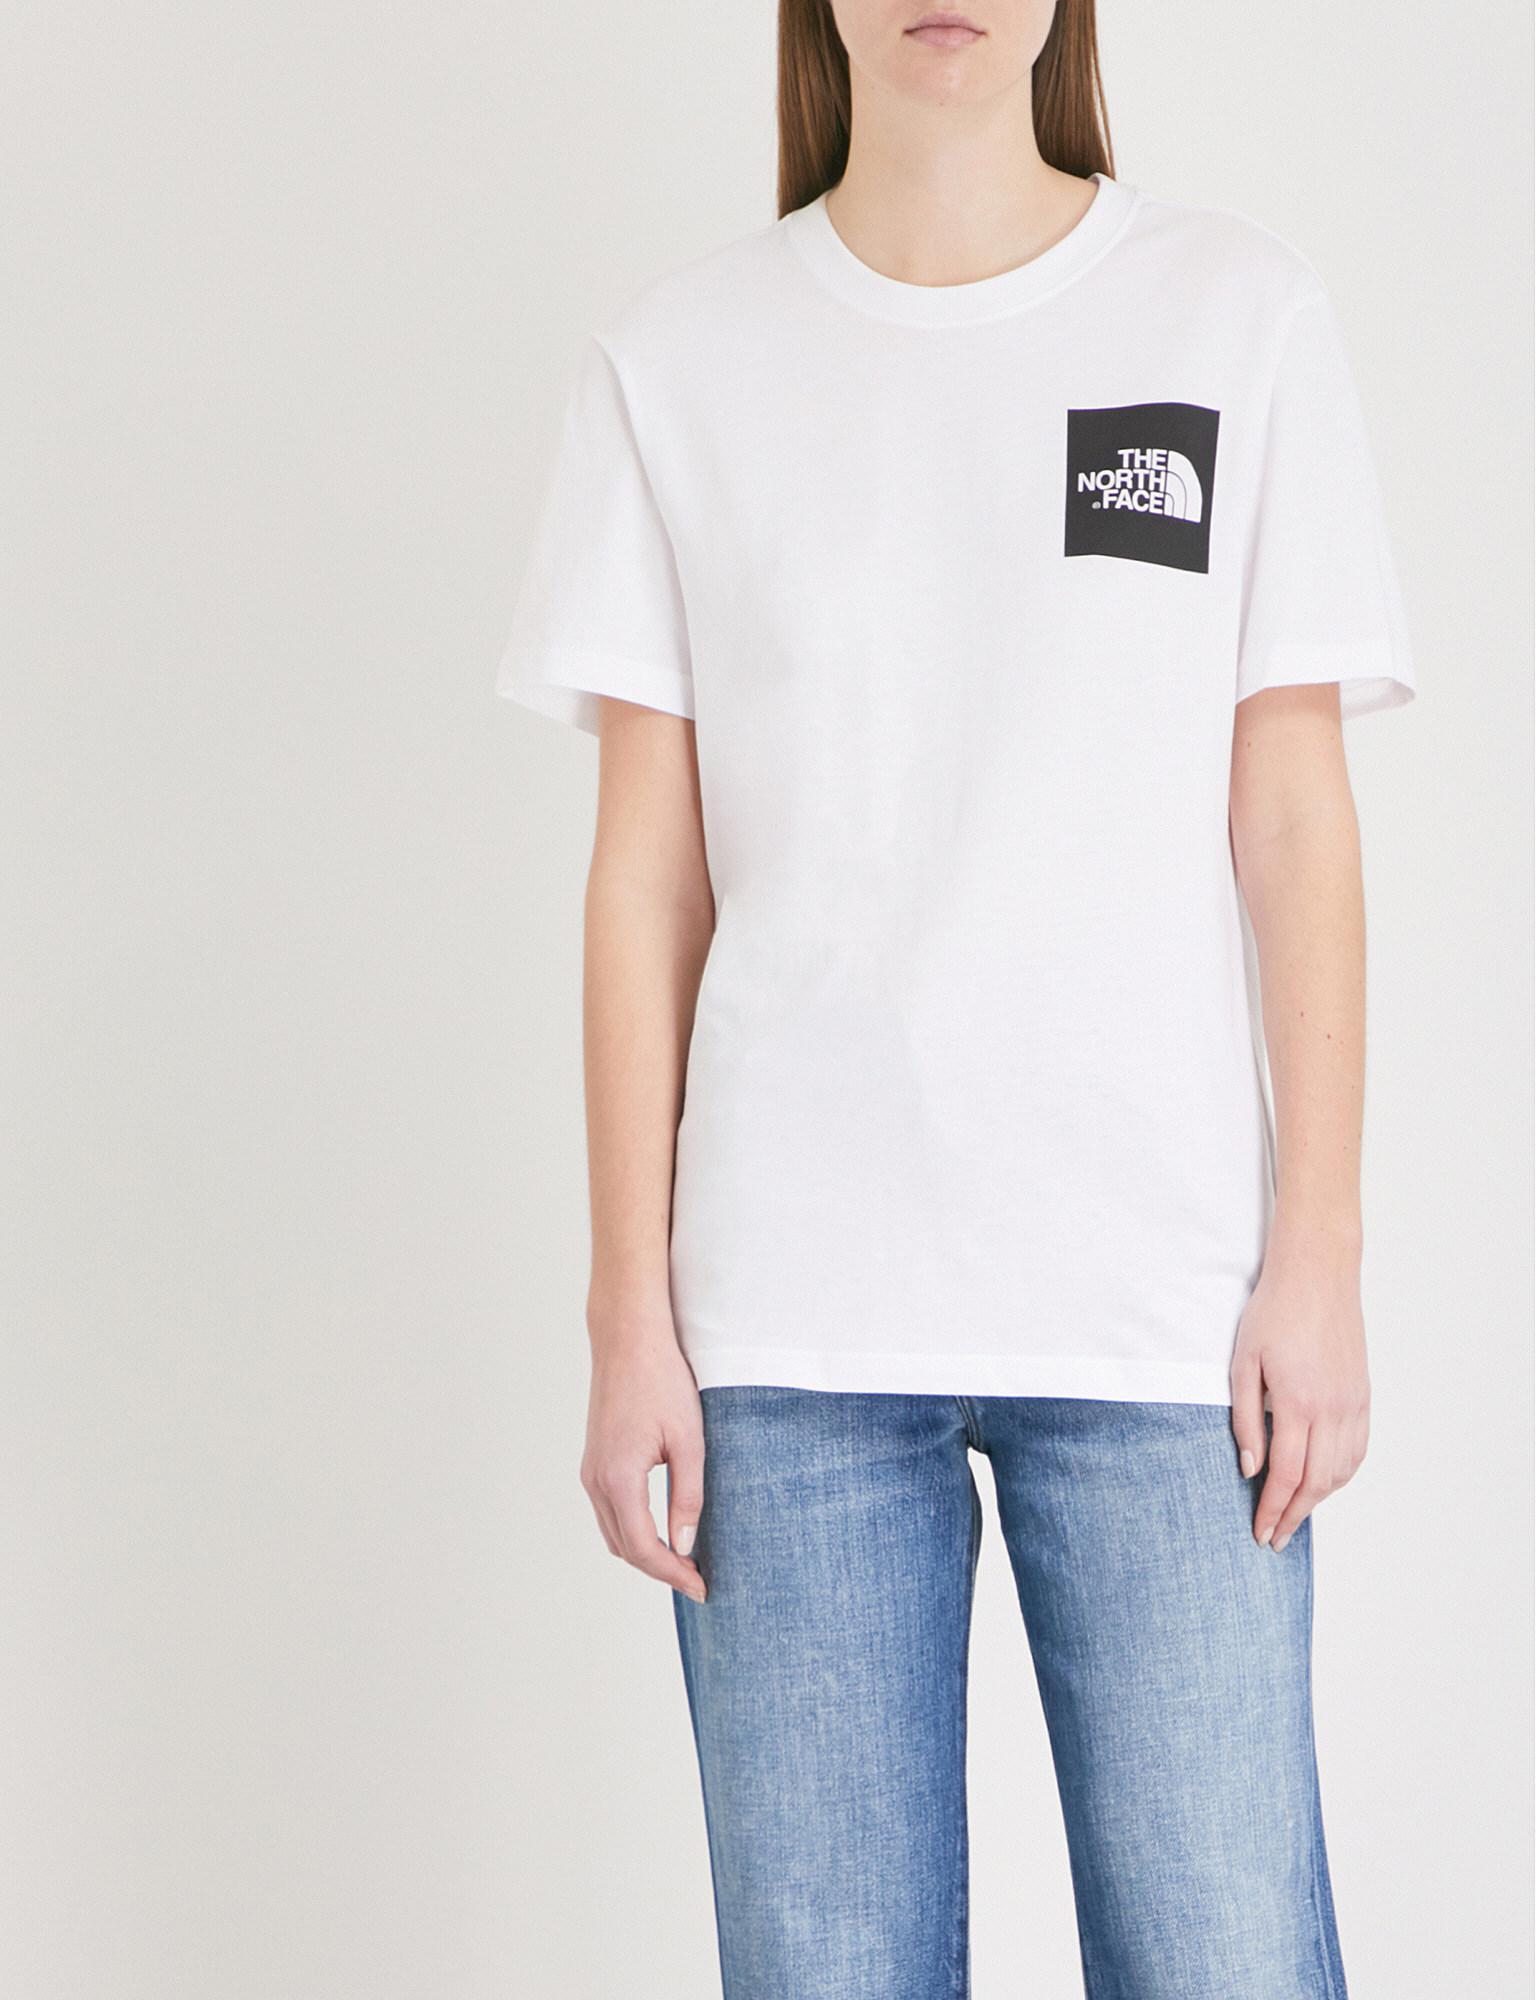 The North Face. Women's White Logo-print Cotton-jersey T-shirt